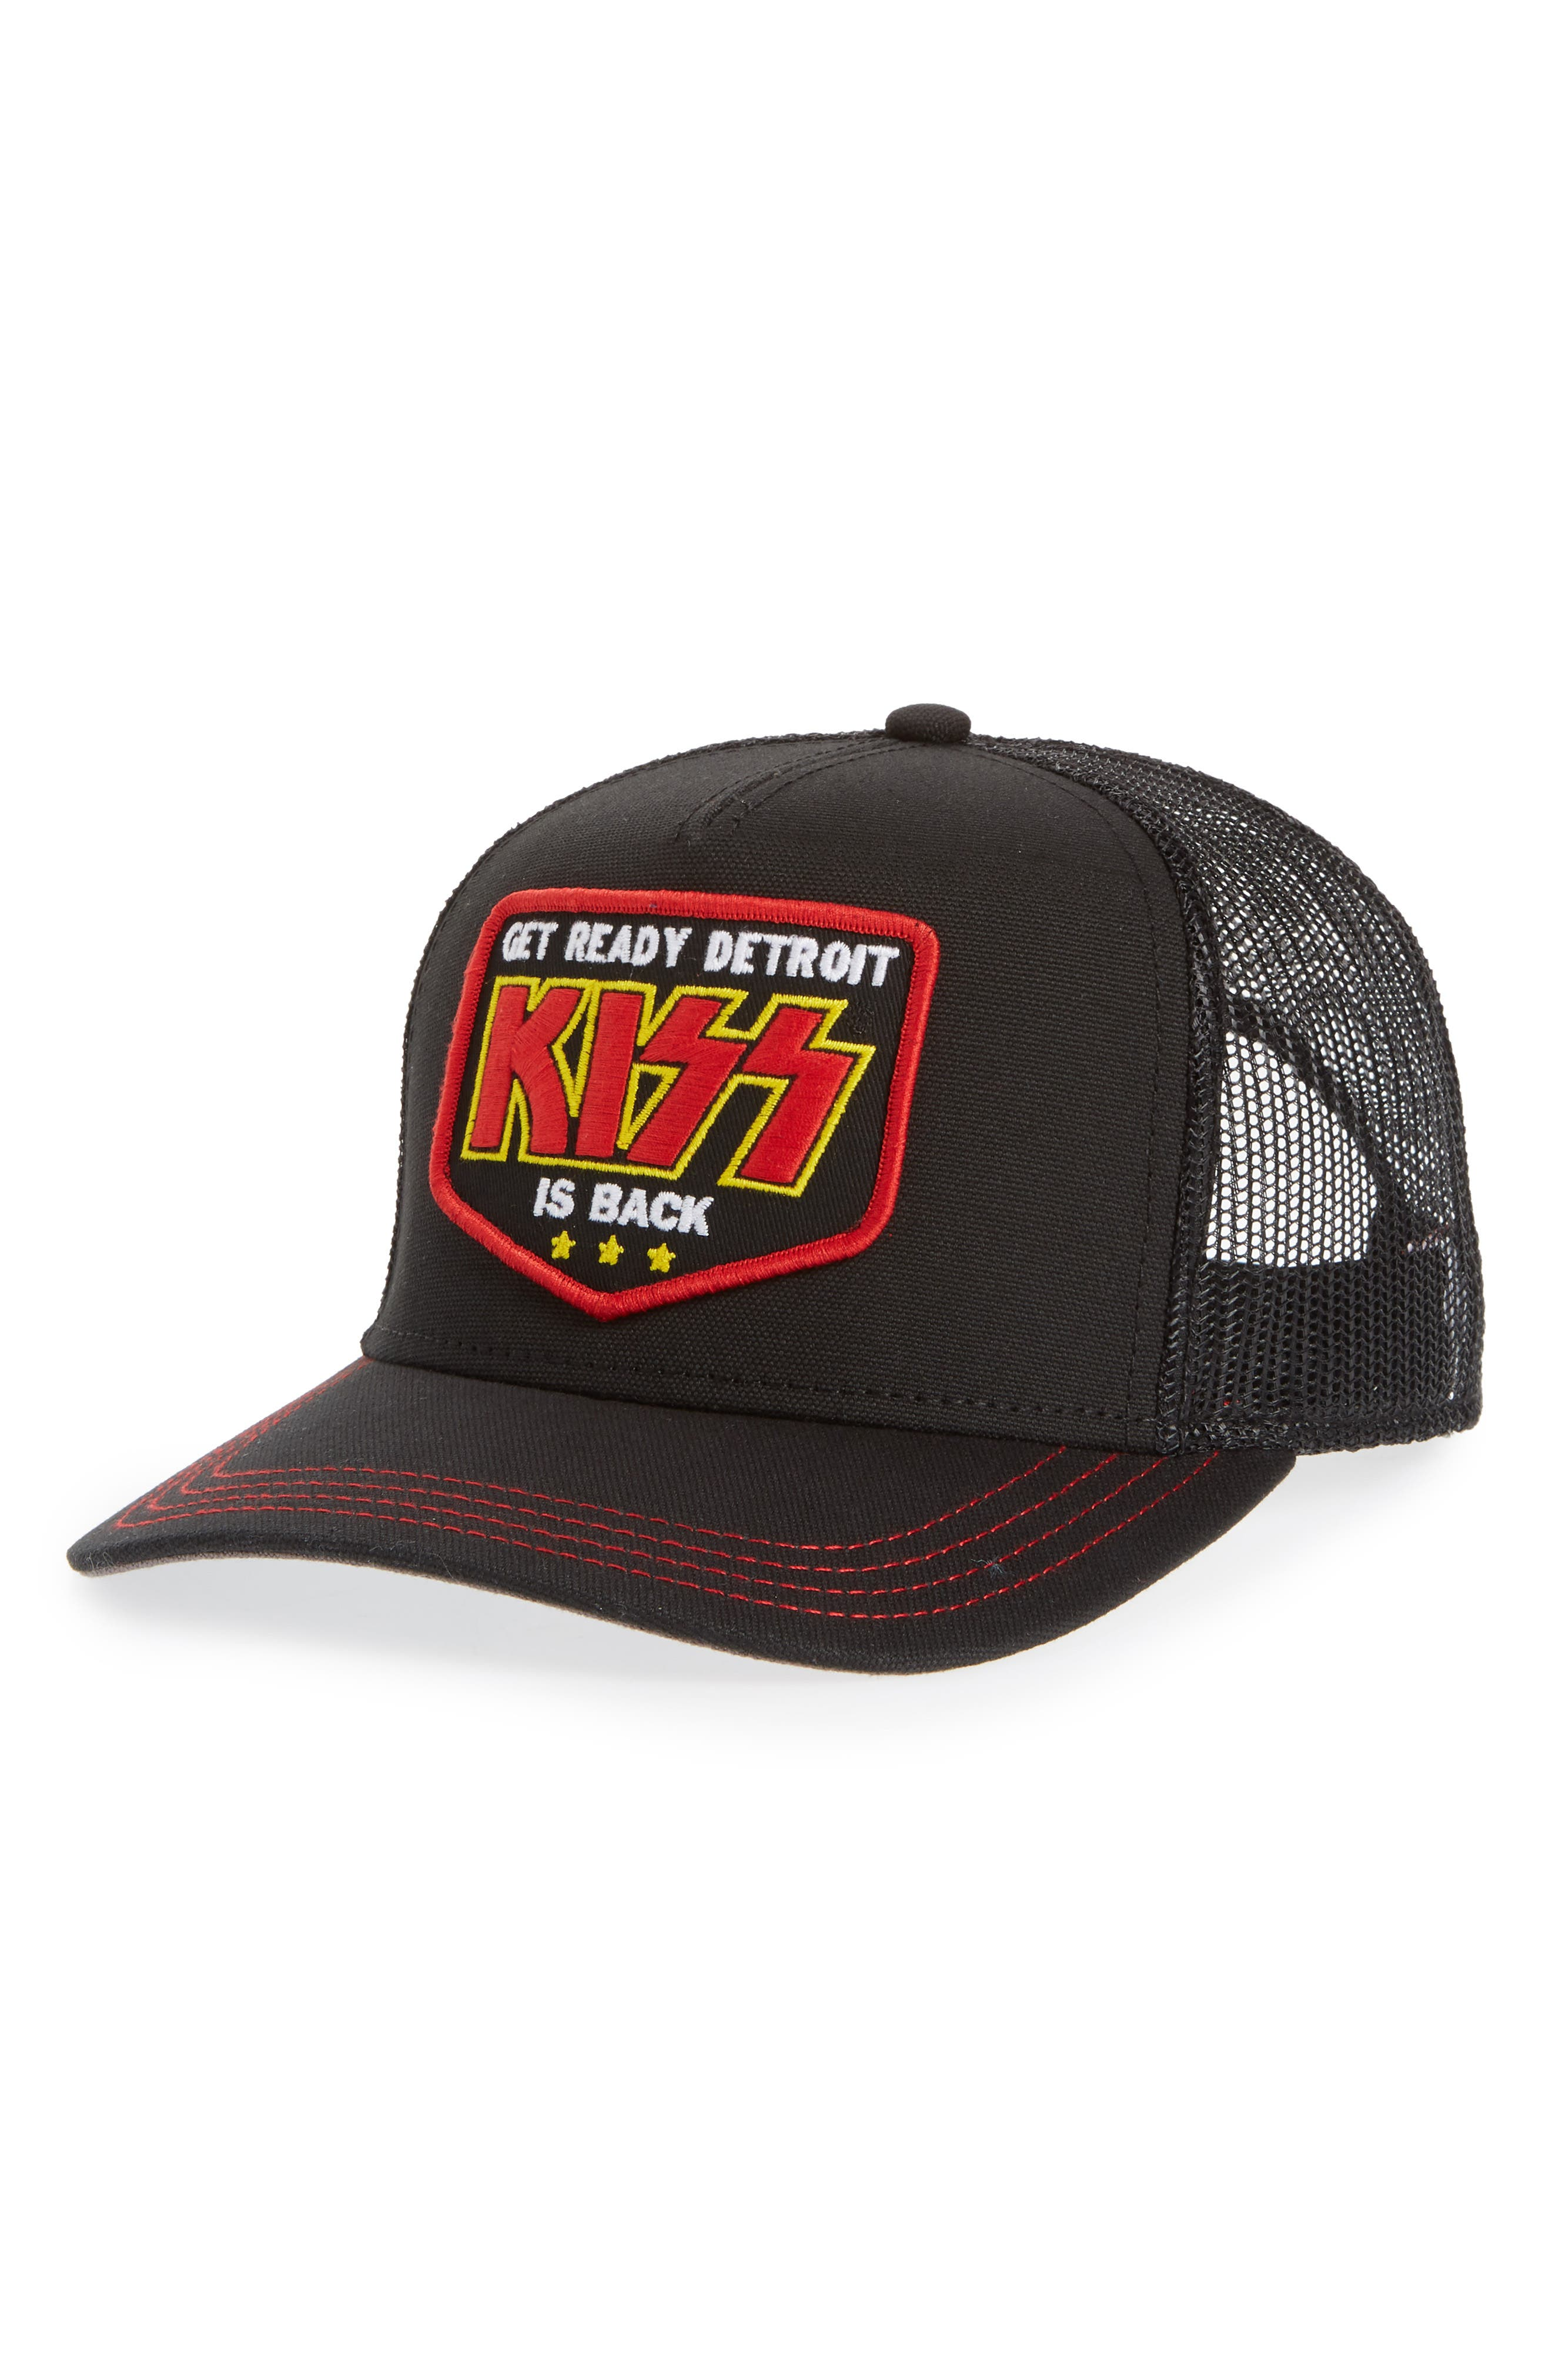 Valin KISS Trucker Hat,                             Main thumbnail 1, color,                             Black